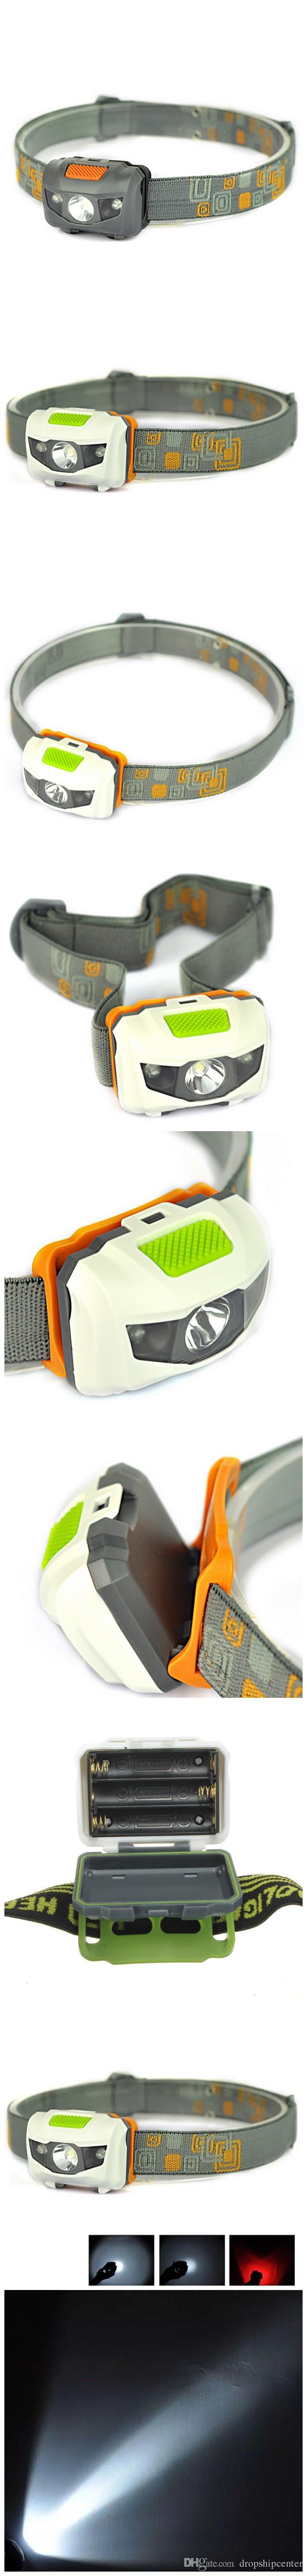 Mini Taşınabilir Far 600LM Far Cree R3 Farlar Ile 2 LED El Feneri Farlar Torch Lanterna Kafa Yürüyüş Kamp